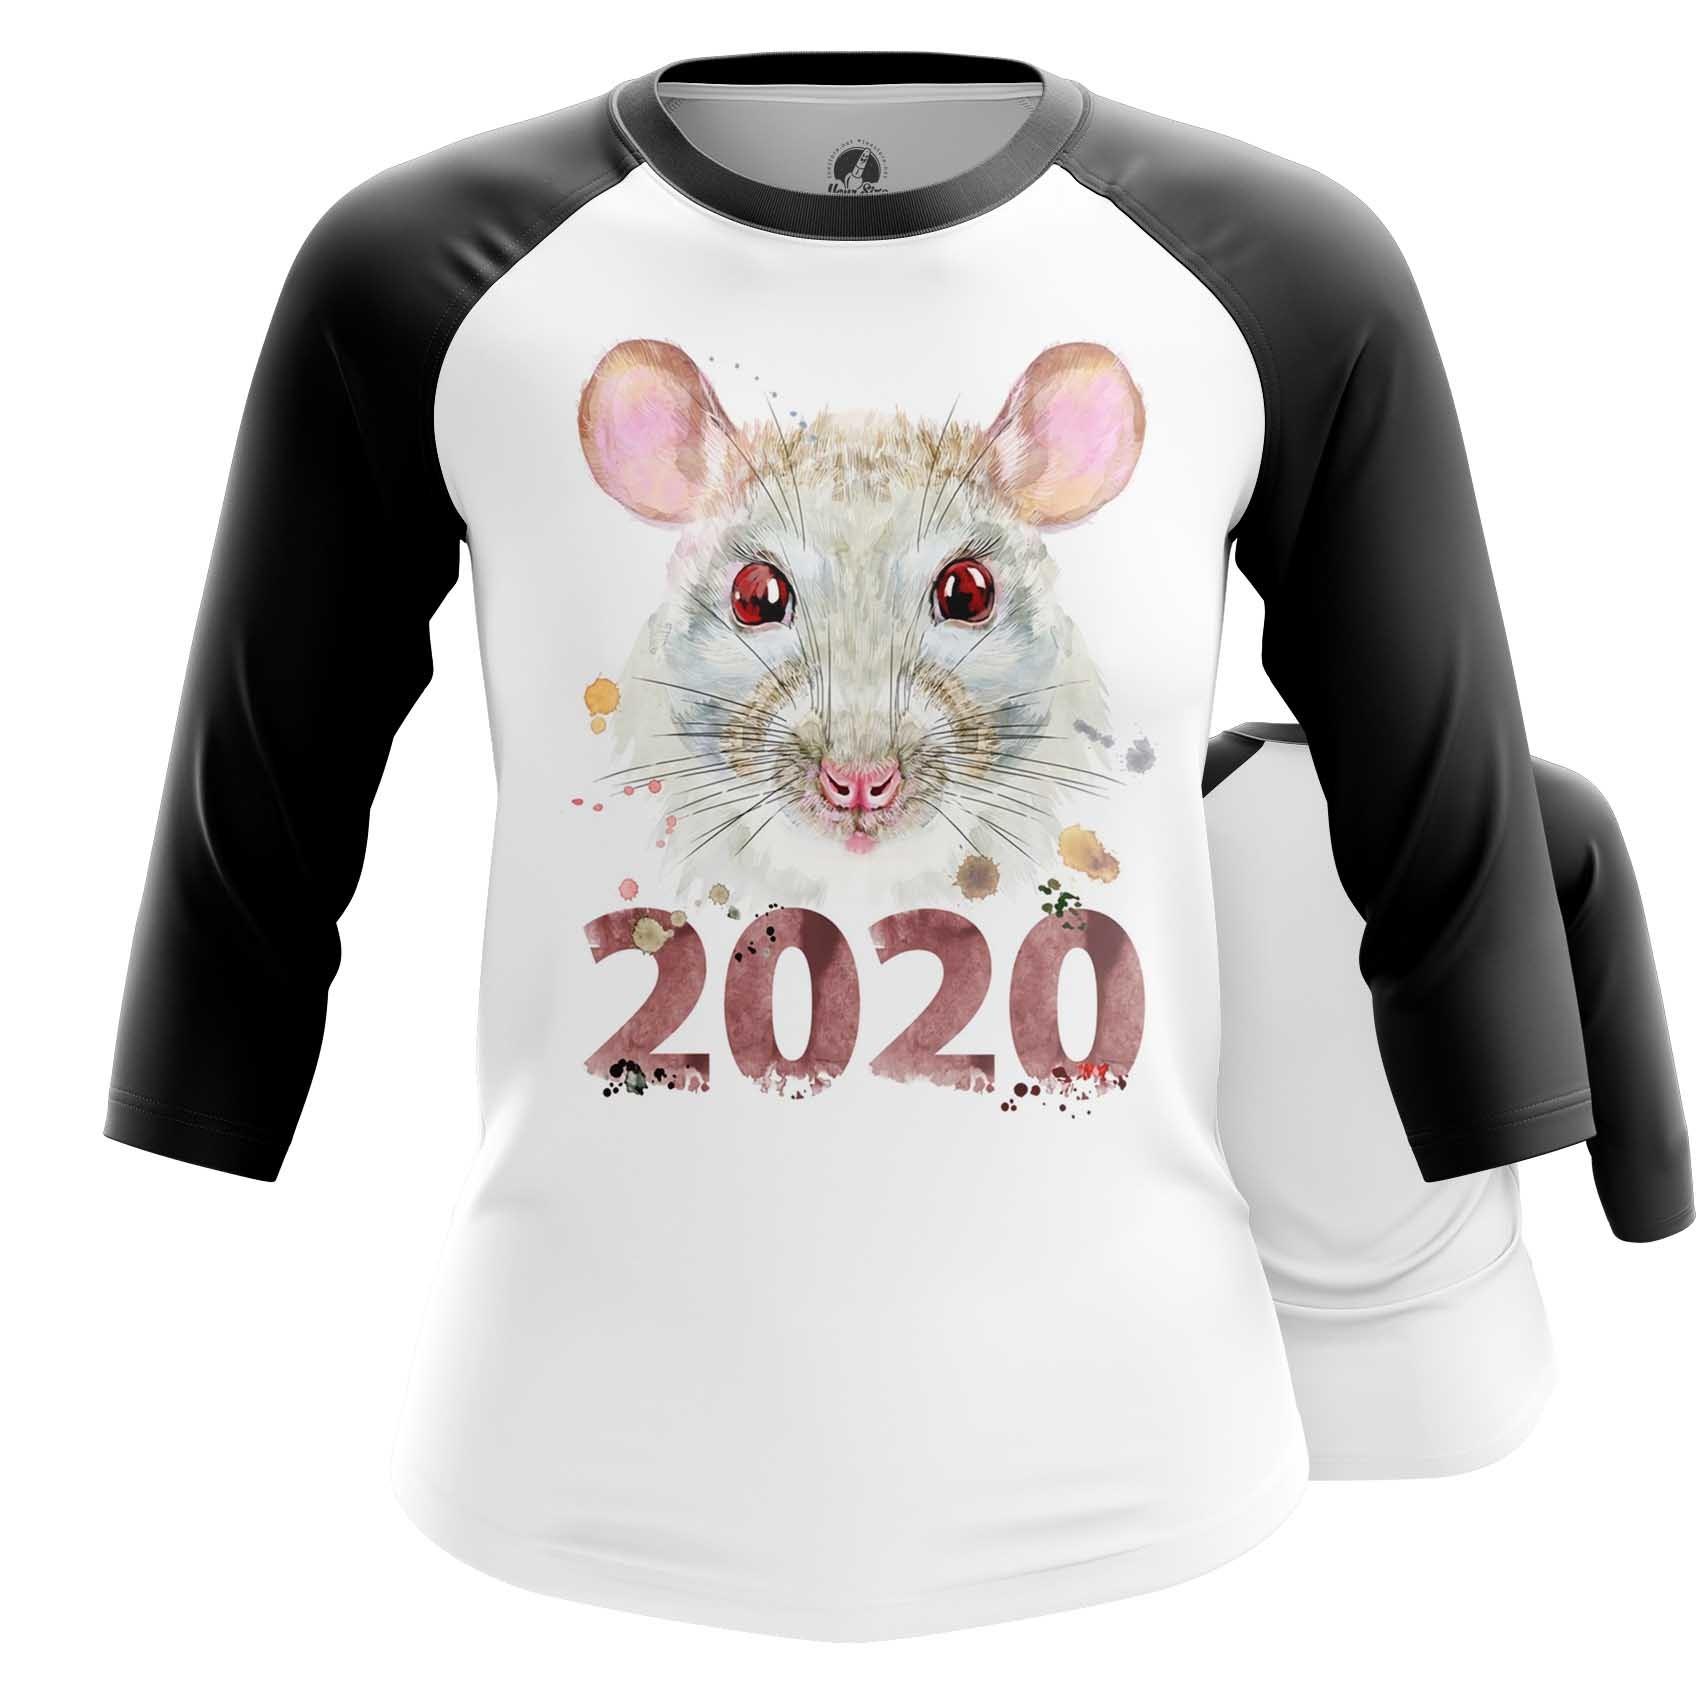 Merch Women'S Raglan New Year 2020 Symbols